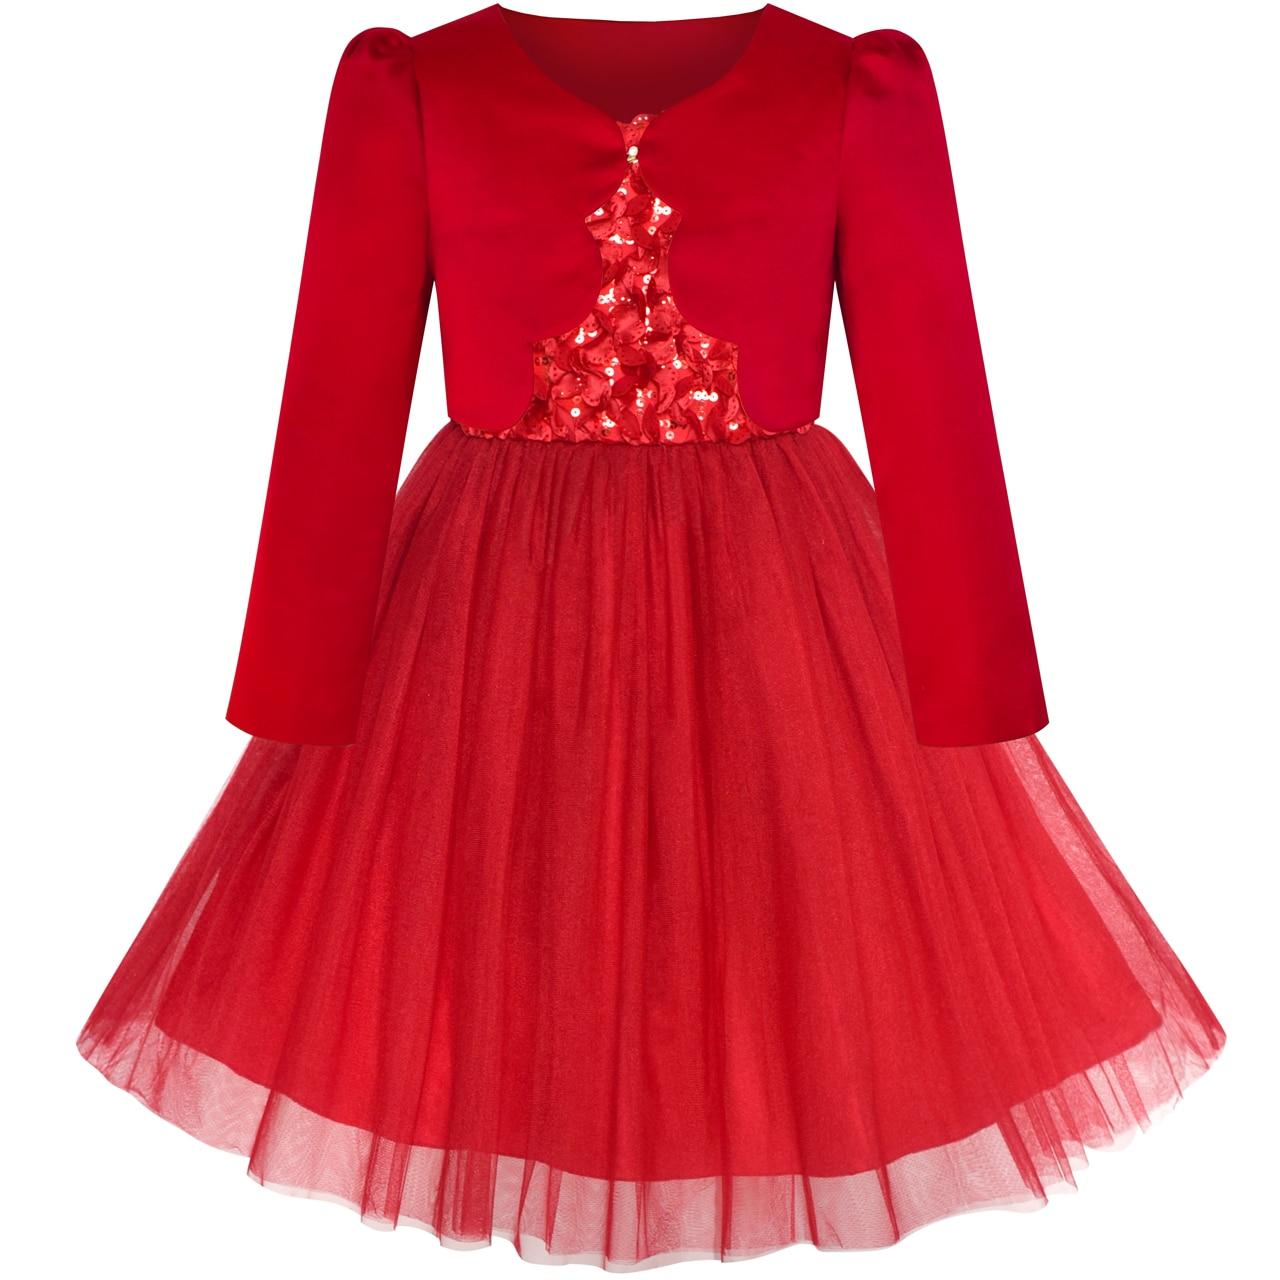 Flower     Girls     Dress   Red Long Sleeve Shrug Bolero 2019 Summer Princess Wedding Party   Dresses     Girl   Clothes Pageant Sundress